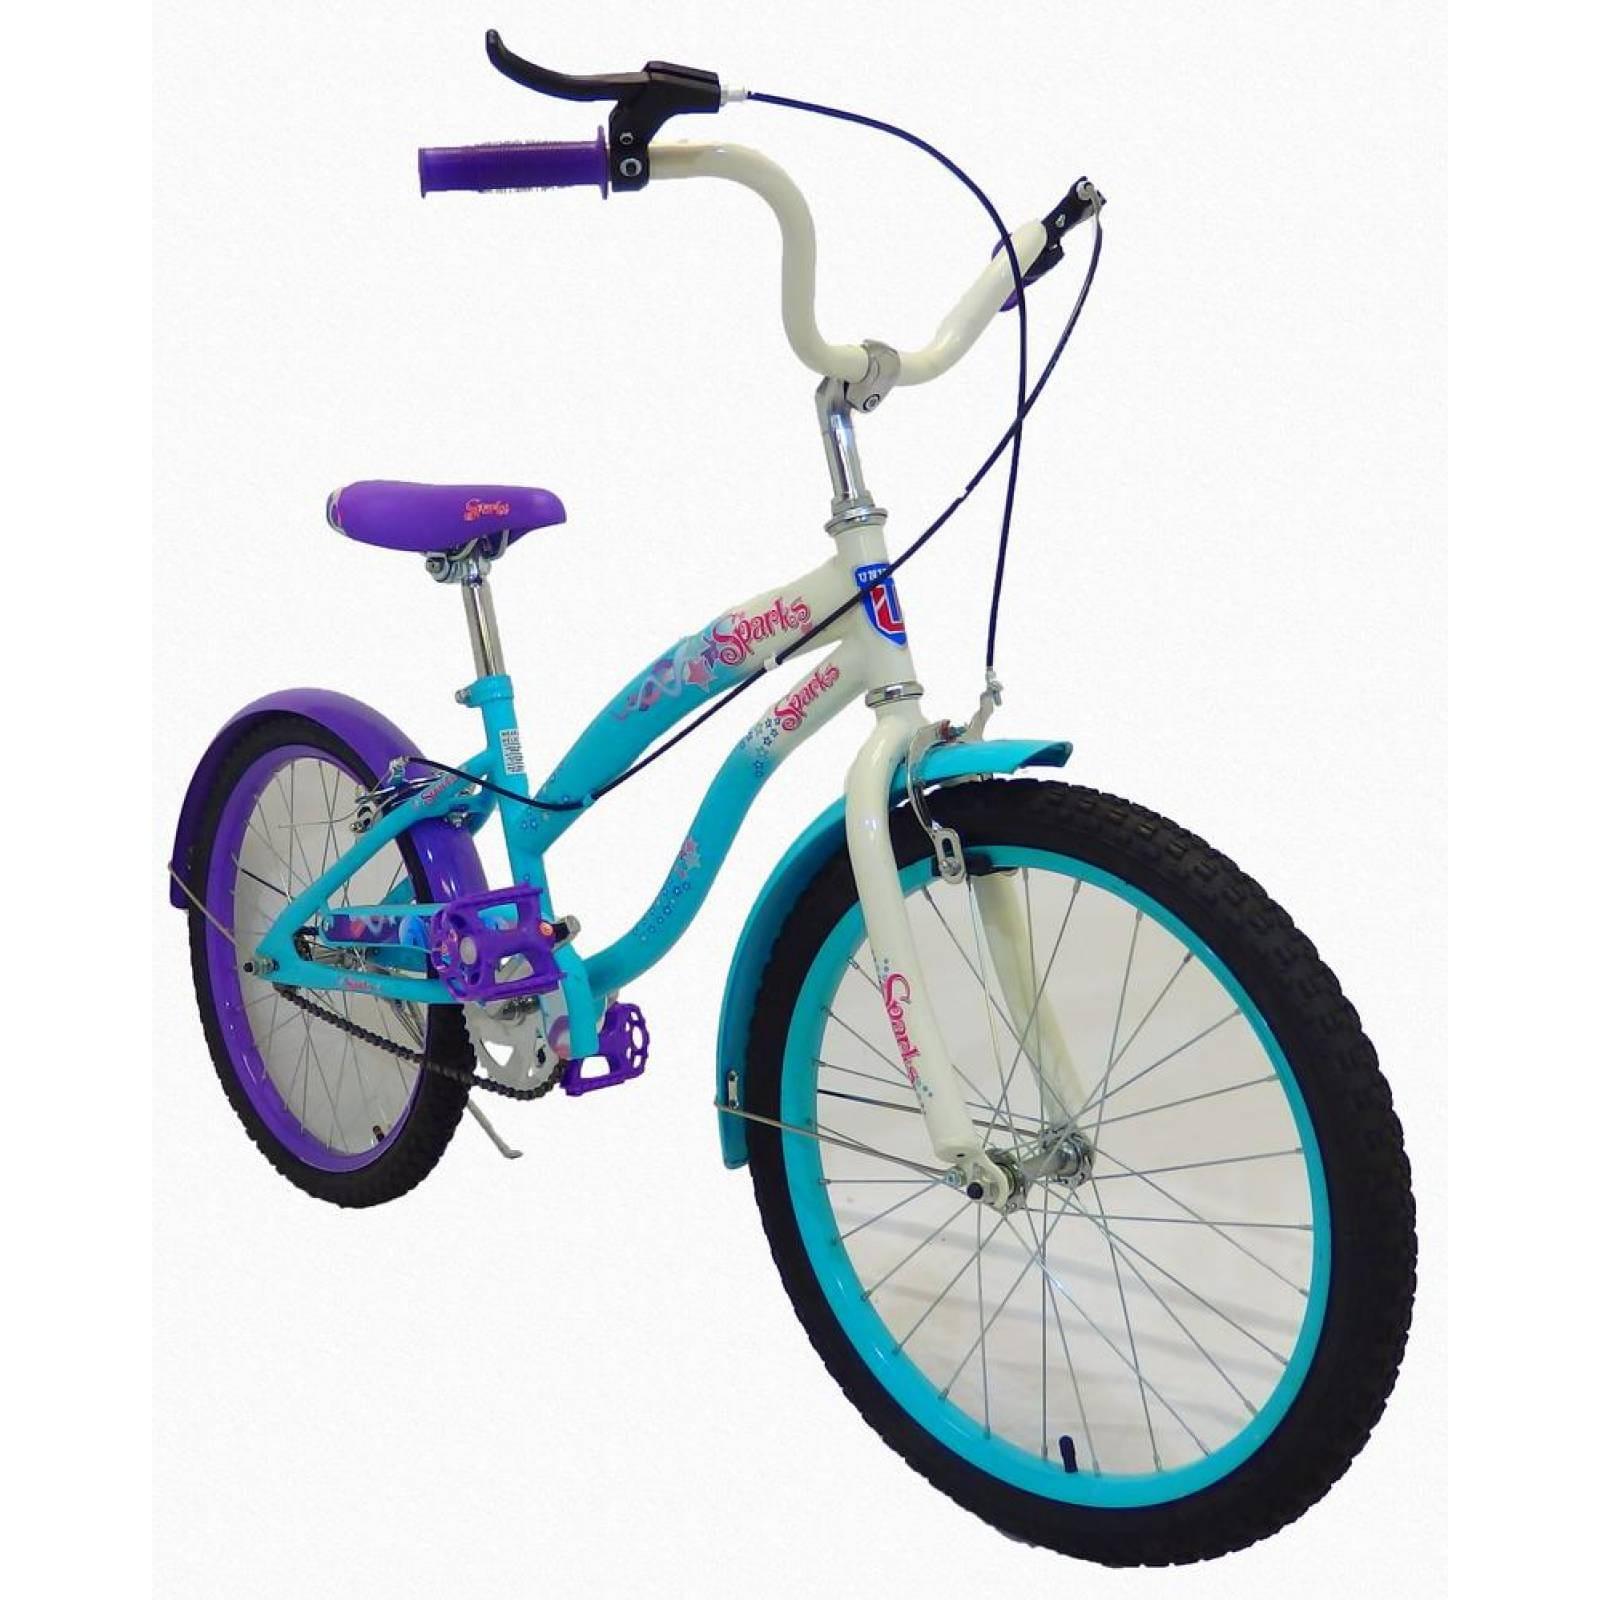 Bicicleta Infantil para niña rodada 20 SPARKS Azul